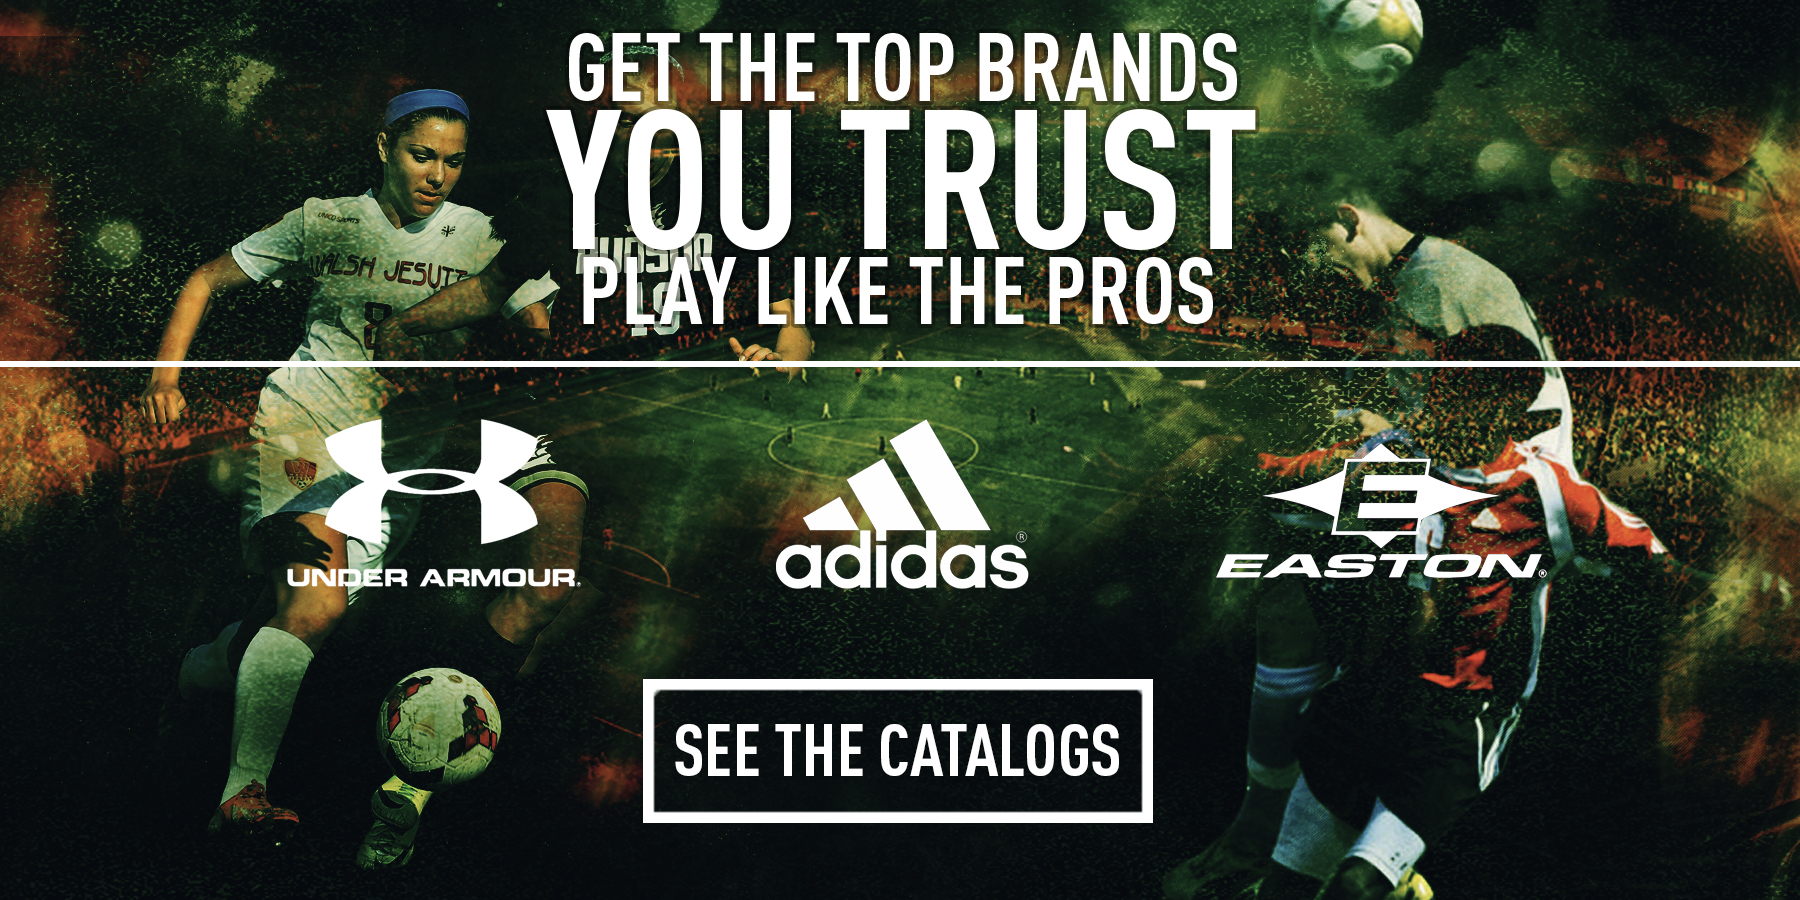 ad catalogs.jpg